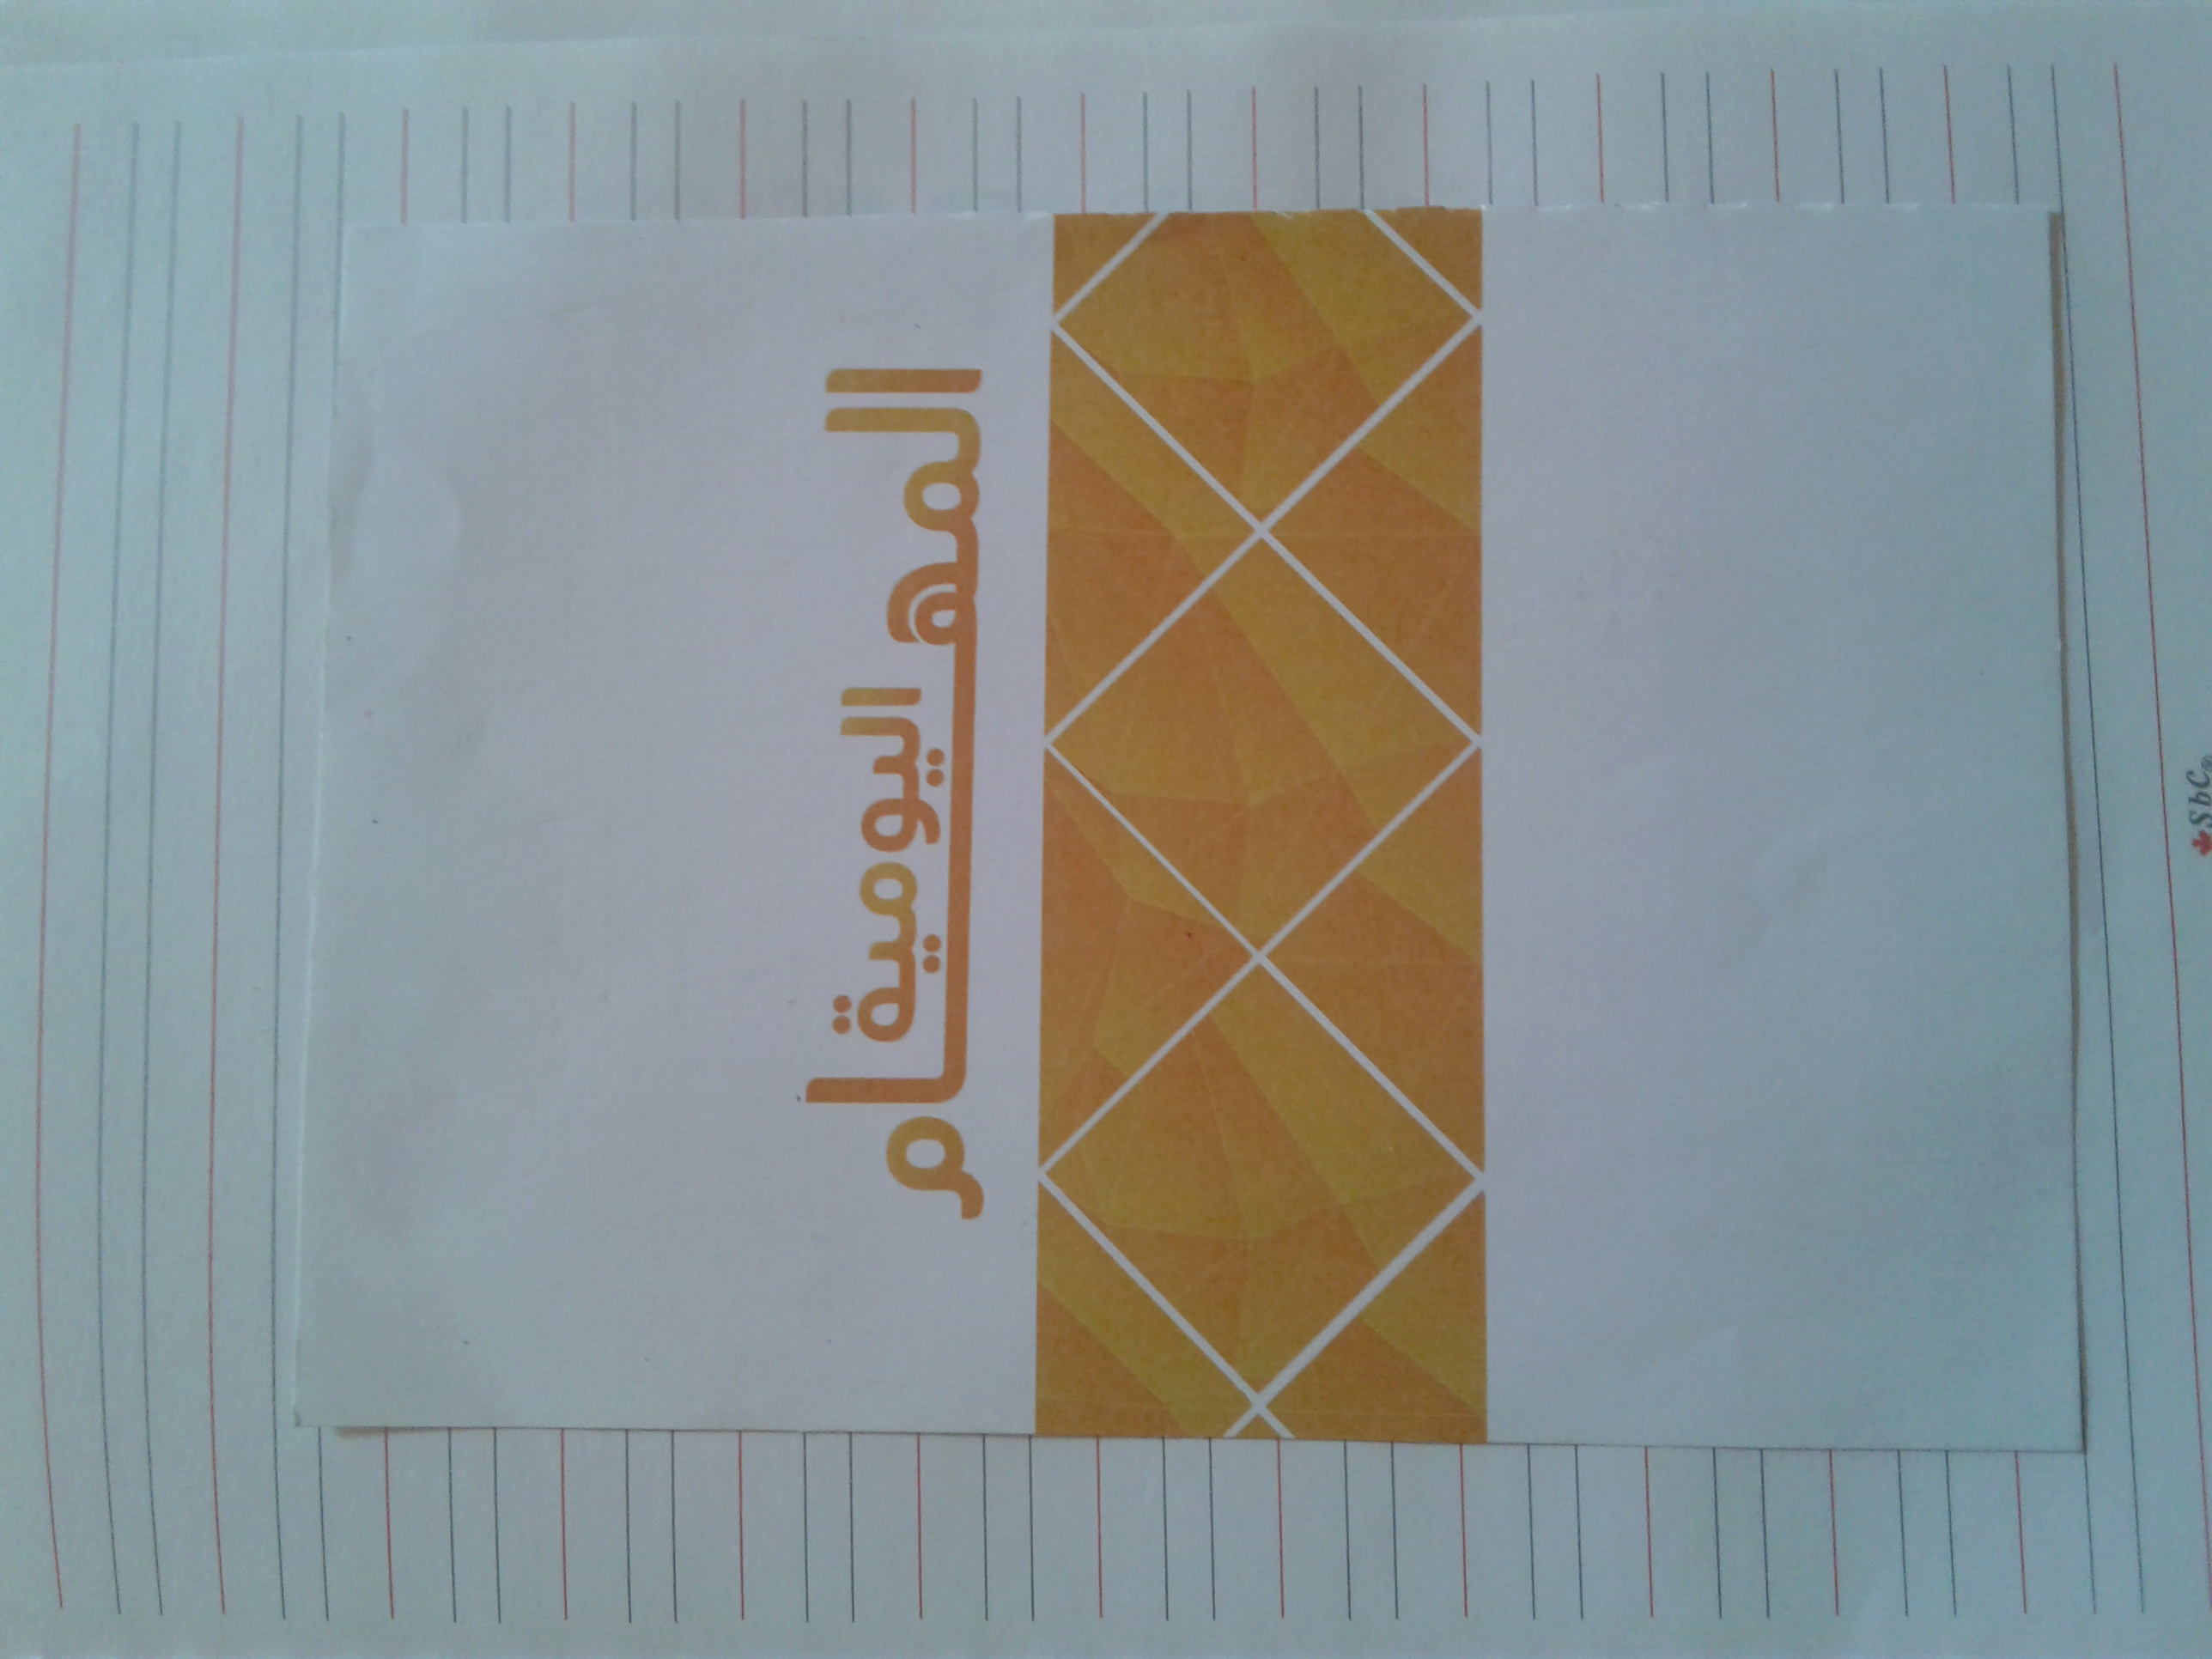 akhawat_islamway_1504360666___.jpg